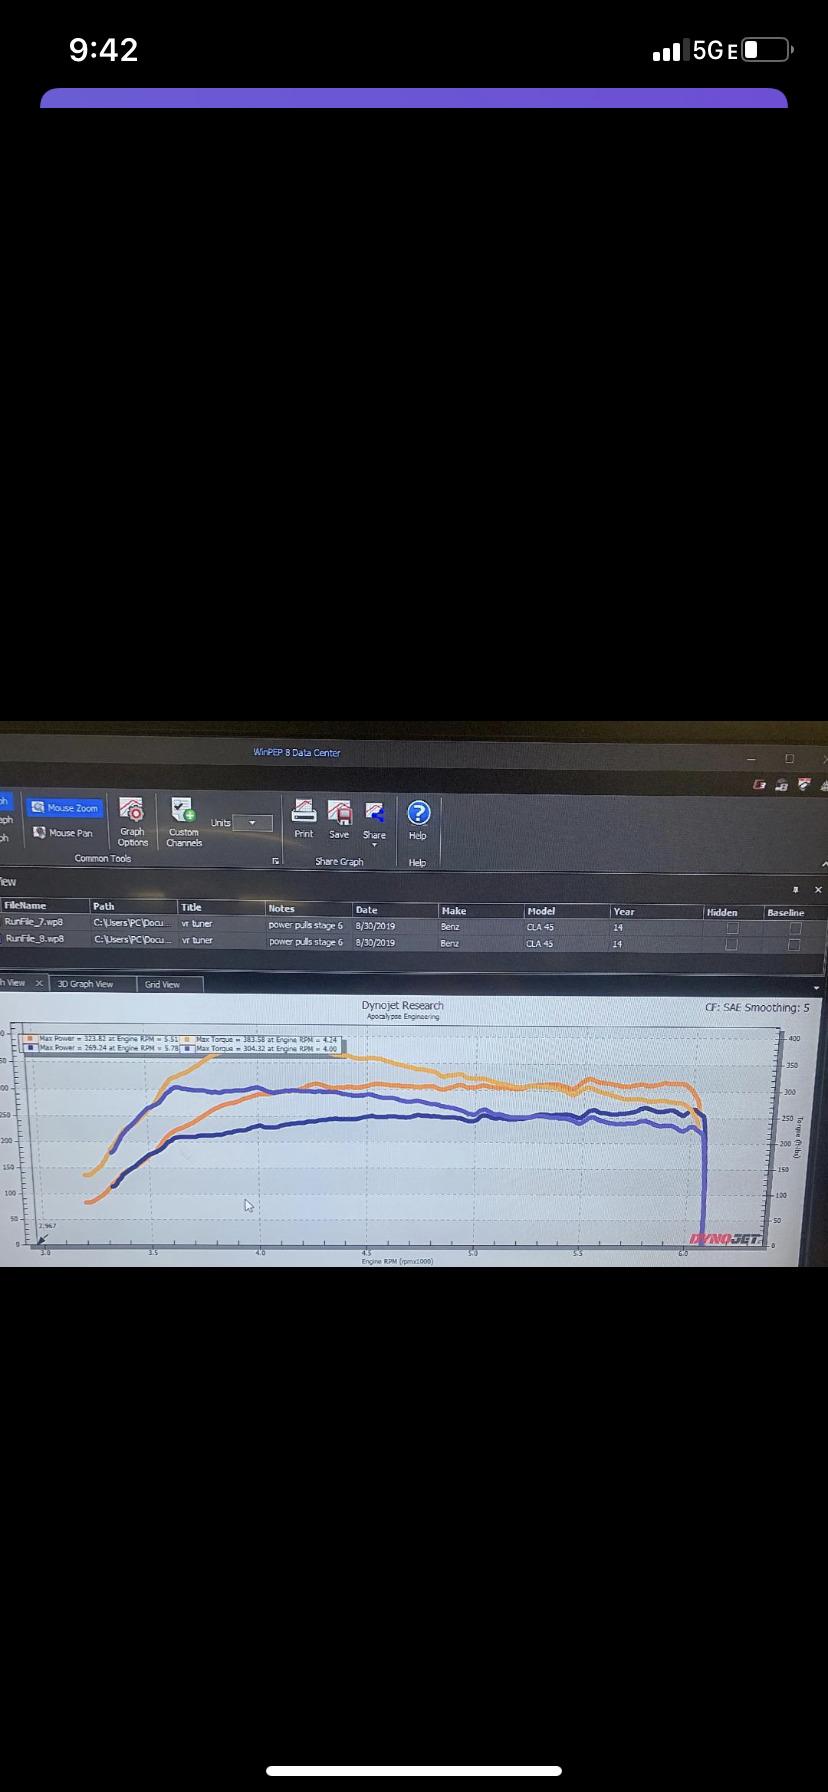 Mercedes-Benz CLA45 AMG Dyno Graph Results